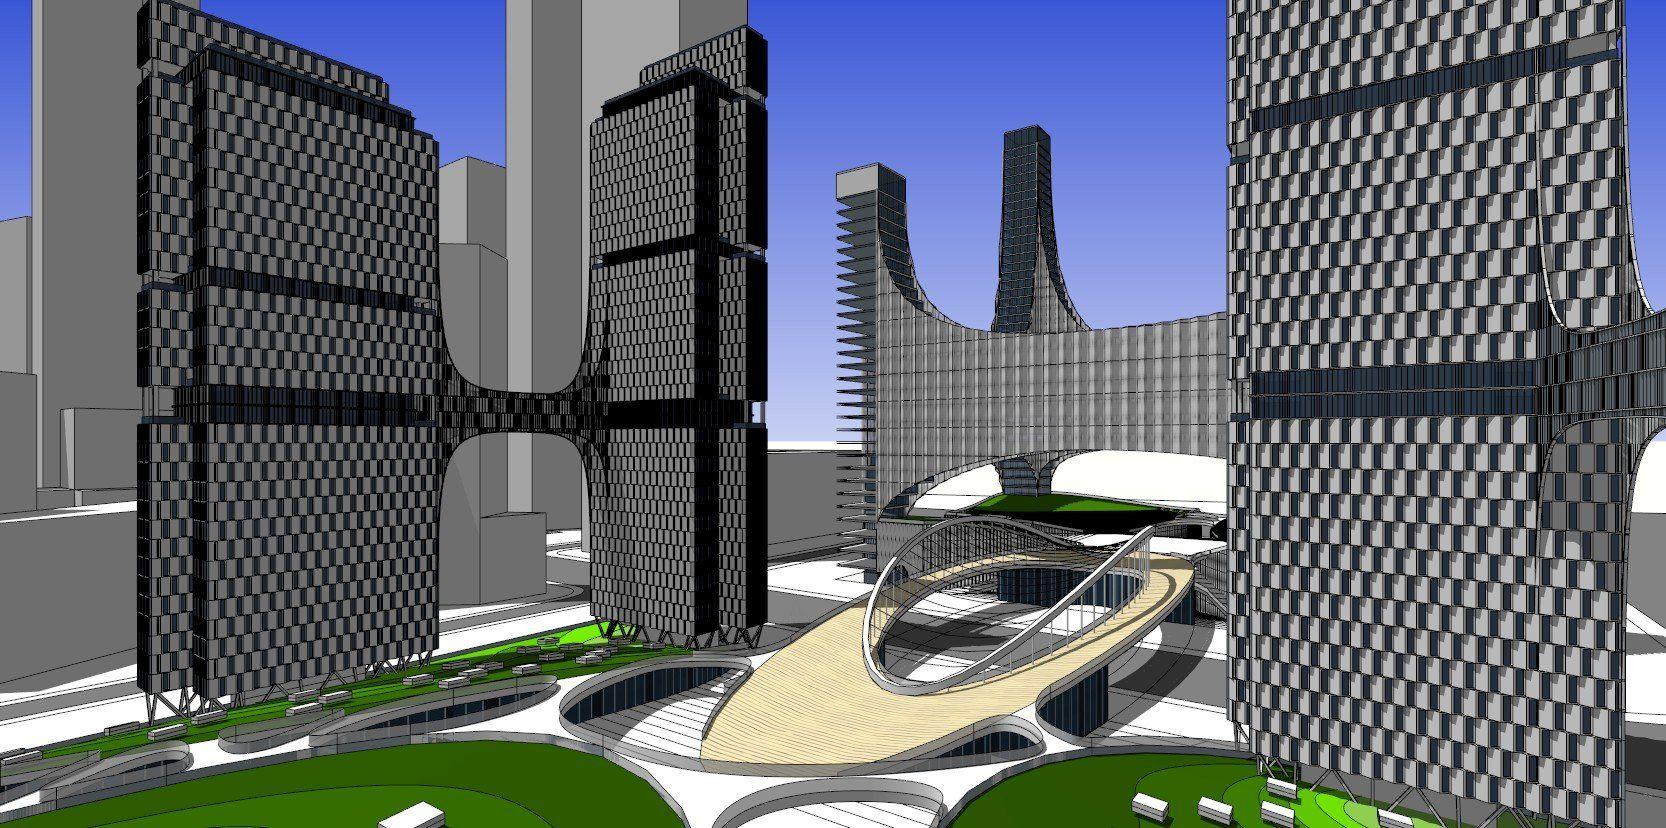 ★Sketchup 3D ModelsSkyscraper Sketchup Models ★Sketchup